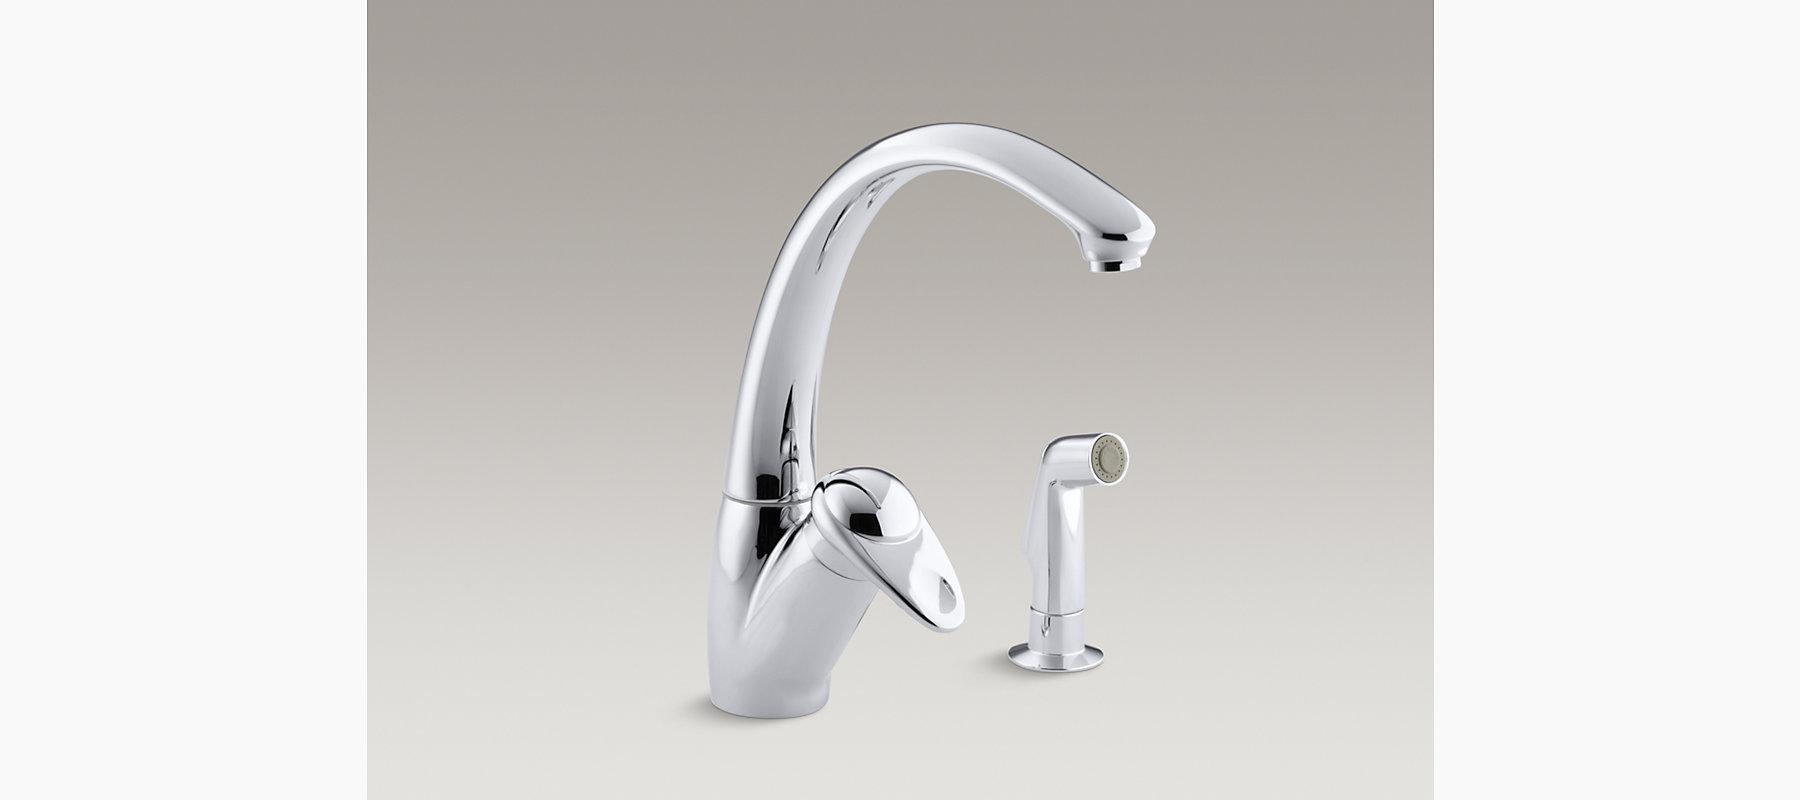 Avatar Single-Handle Kitchen Sink Faucet | K-6356 | KOHLER